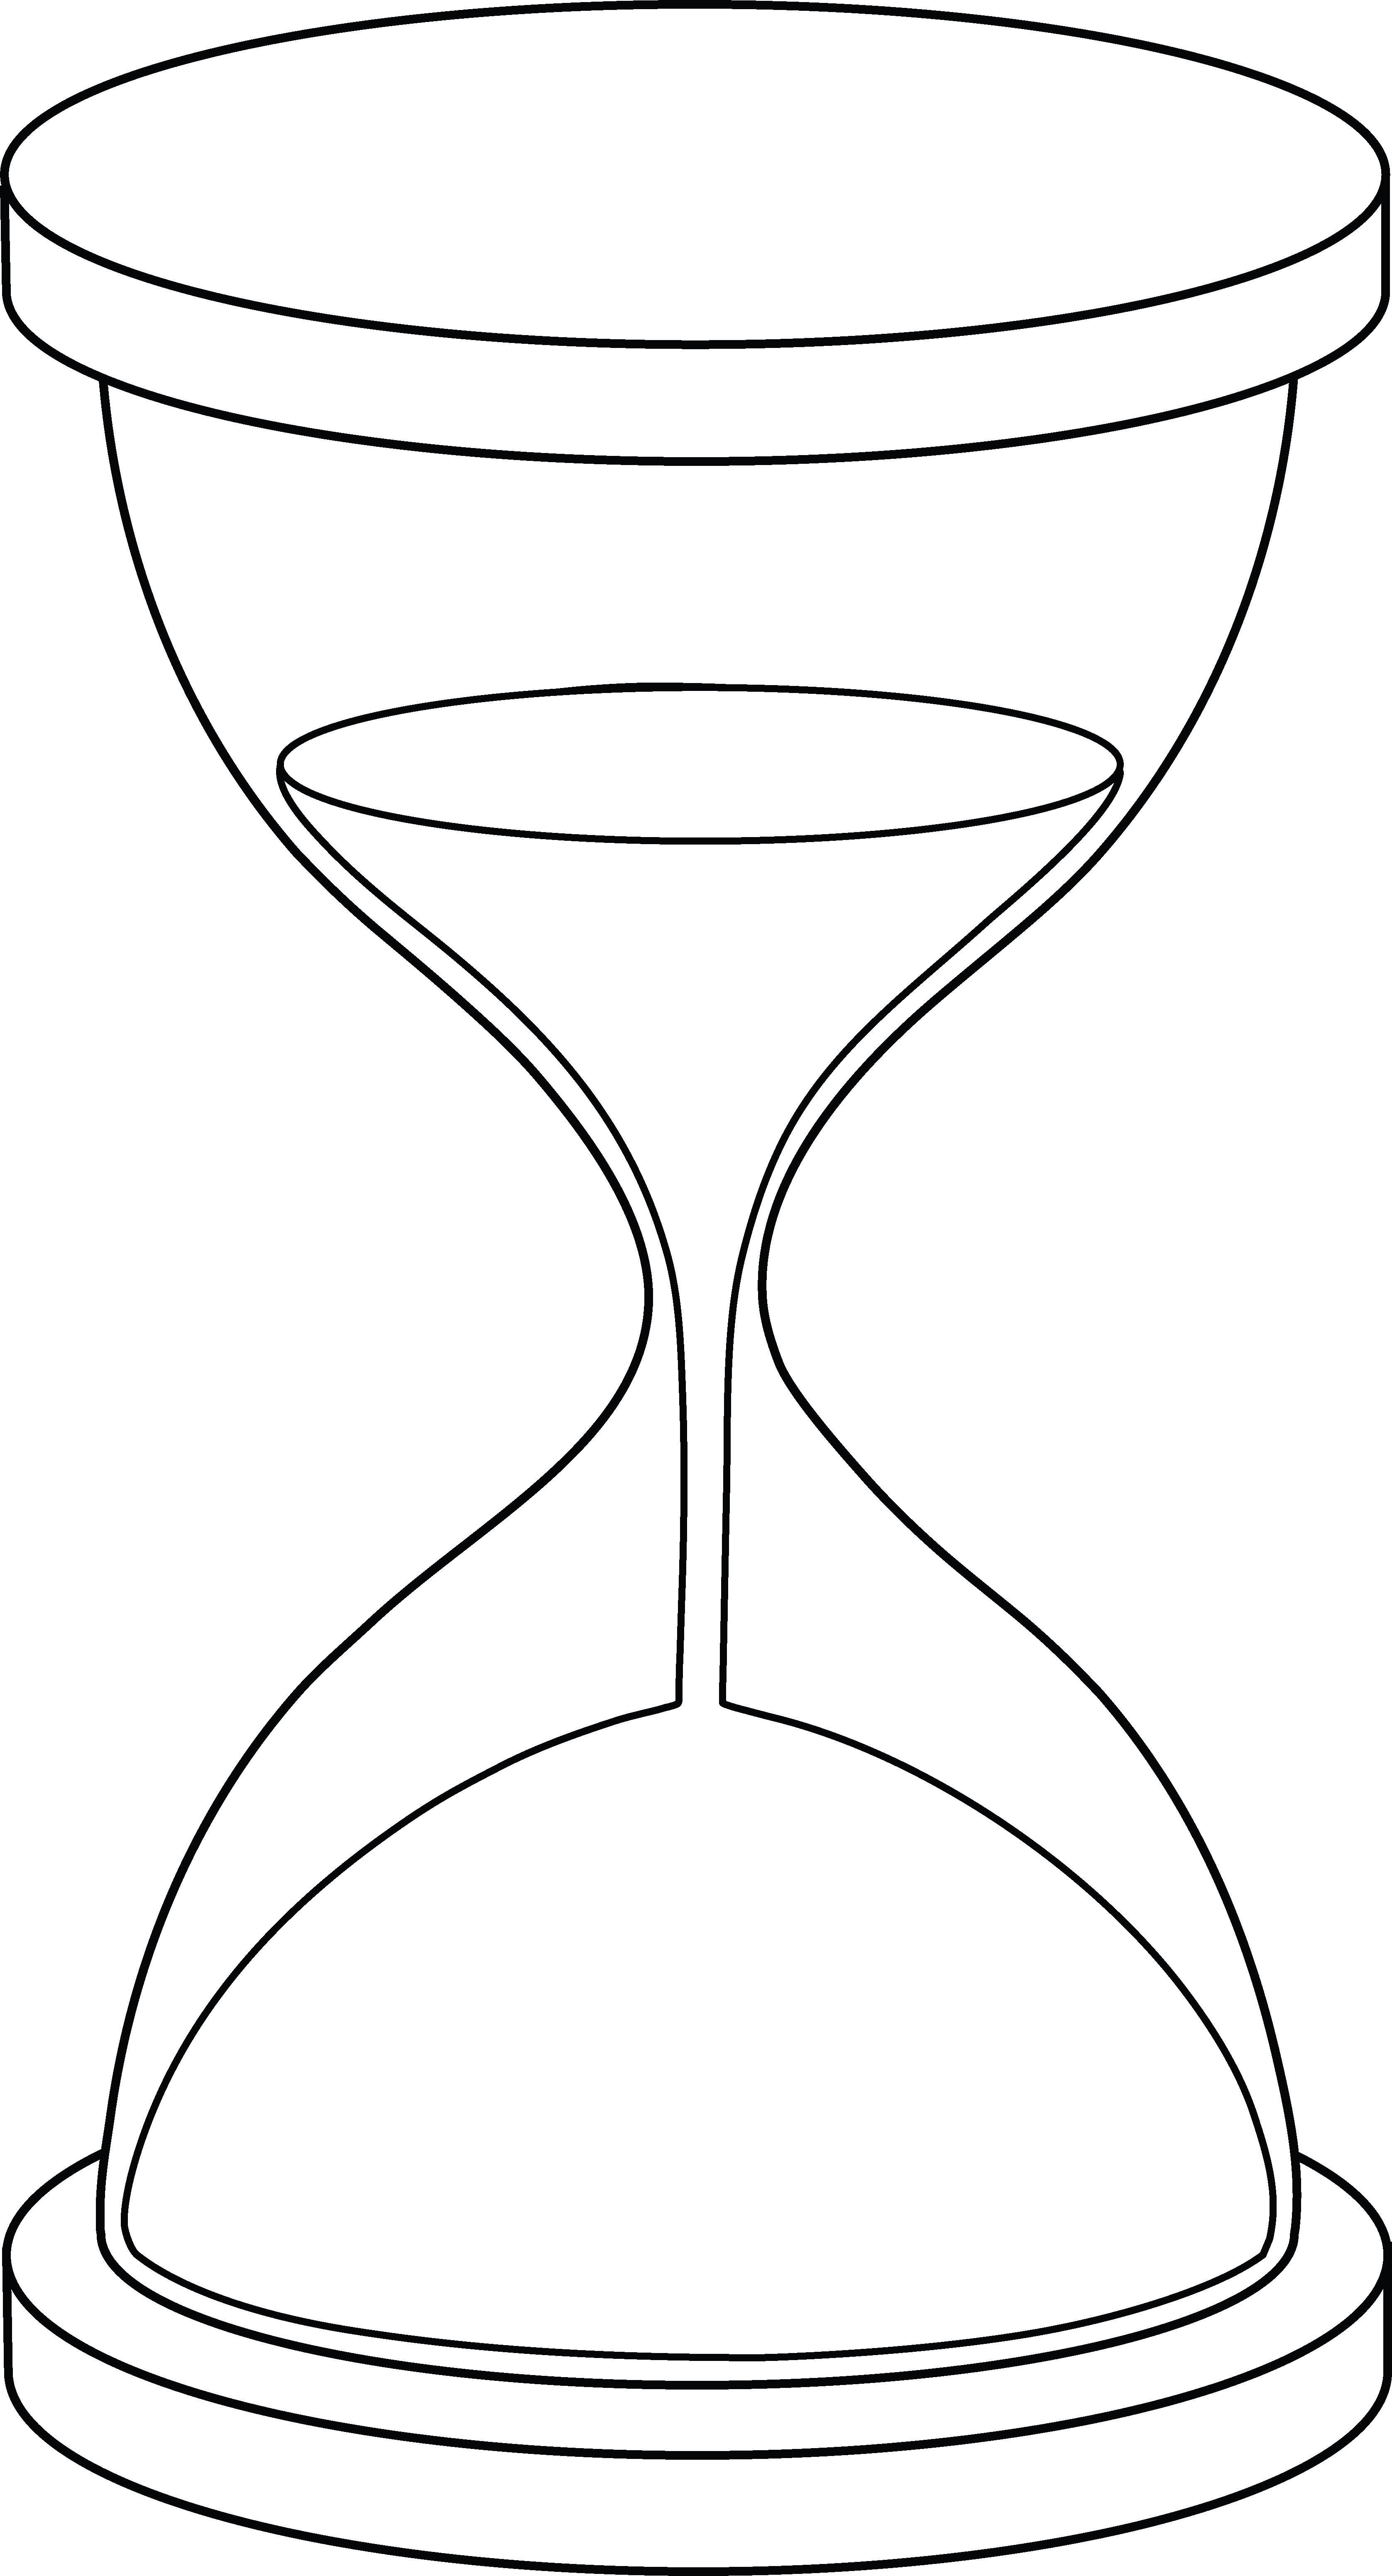 Hourglass clipart simple. Lineart birthdays pinterest line